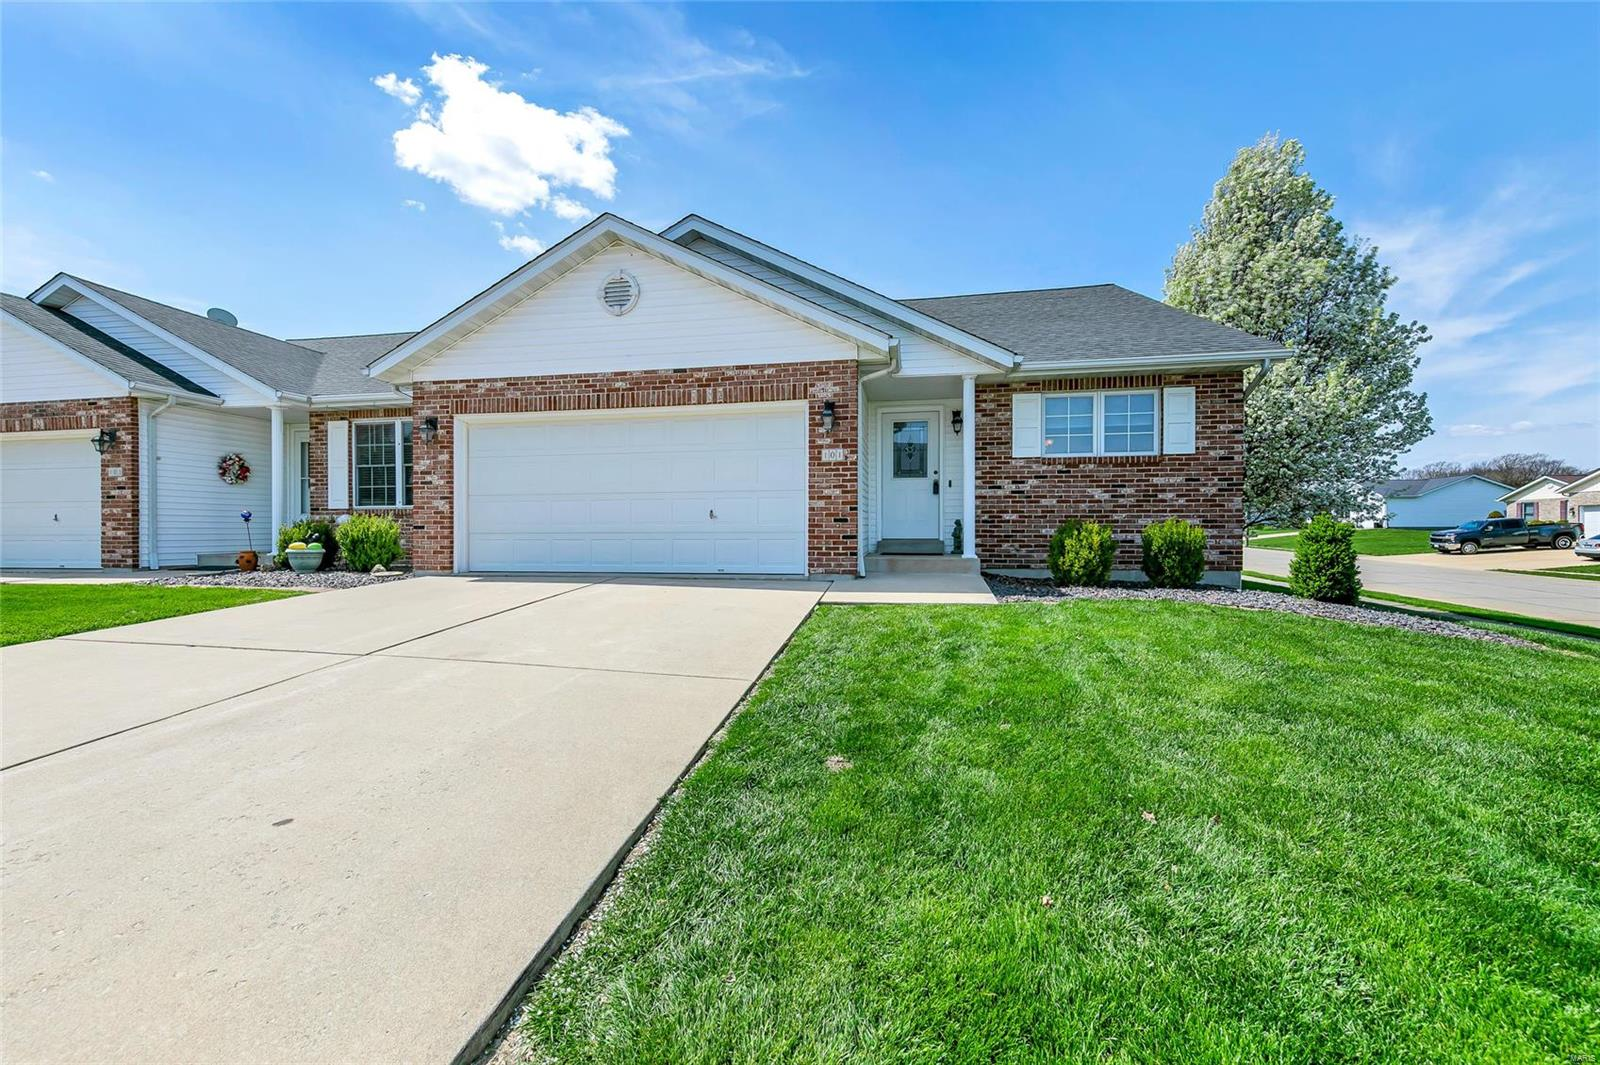 101 Megan Court Property Photo - Valmeyer, IL real estate listing